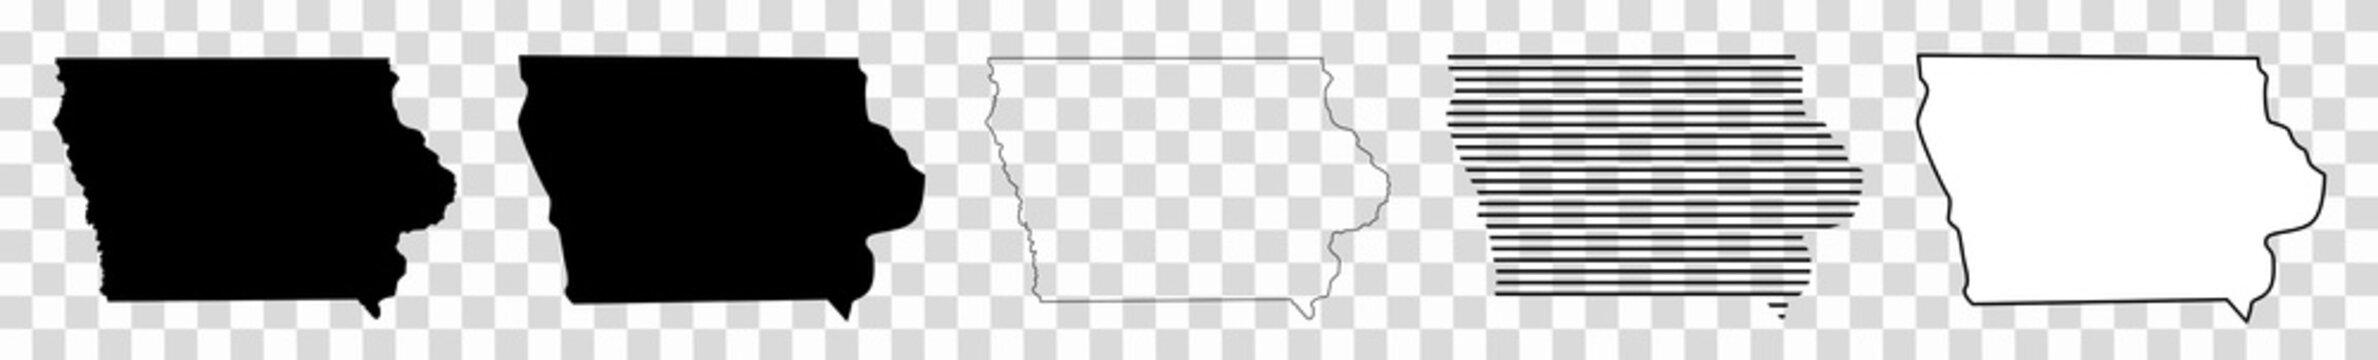 Iowa Map Black   State Border   United States   US America   Transparent Isolated   Variations